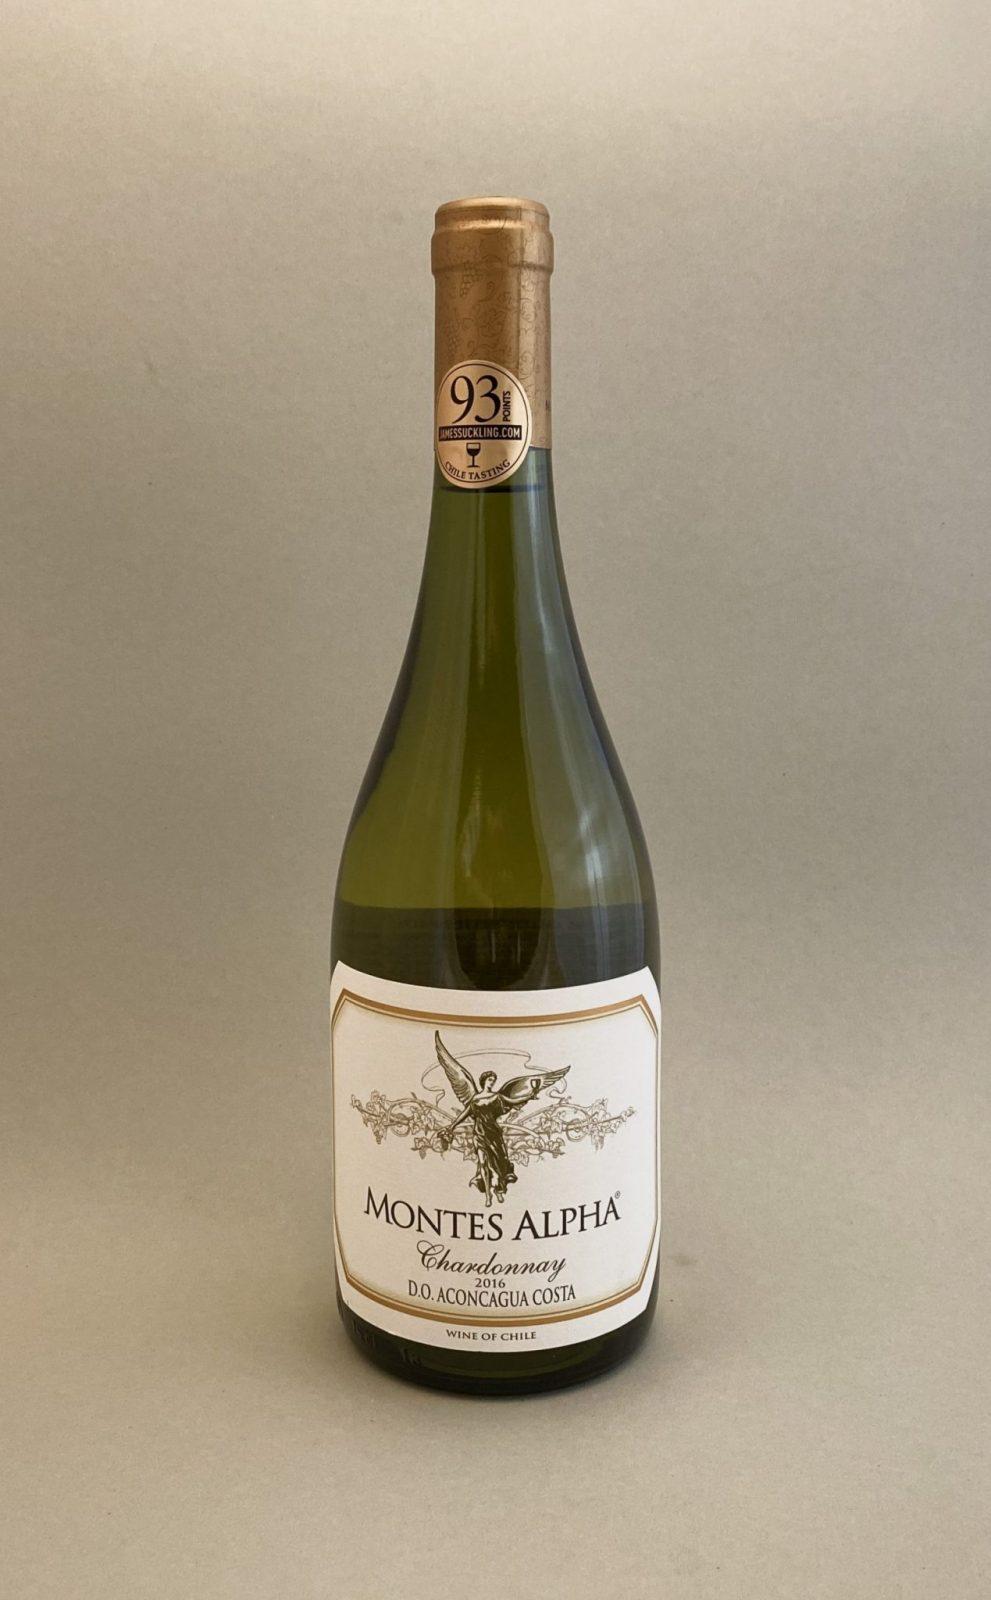 MONTES ALPHA Chardonnay 2016, vinoteka Bratislava Sunny wines slnecnice mesto, petrzalka, vino biele z Chille